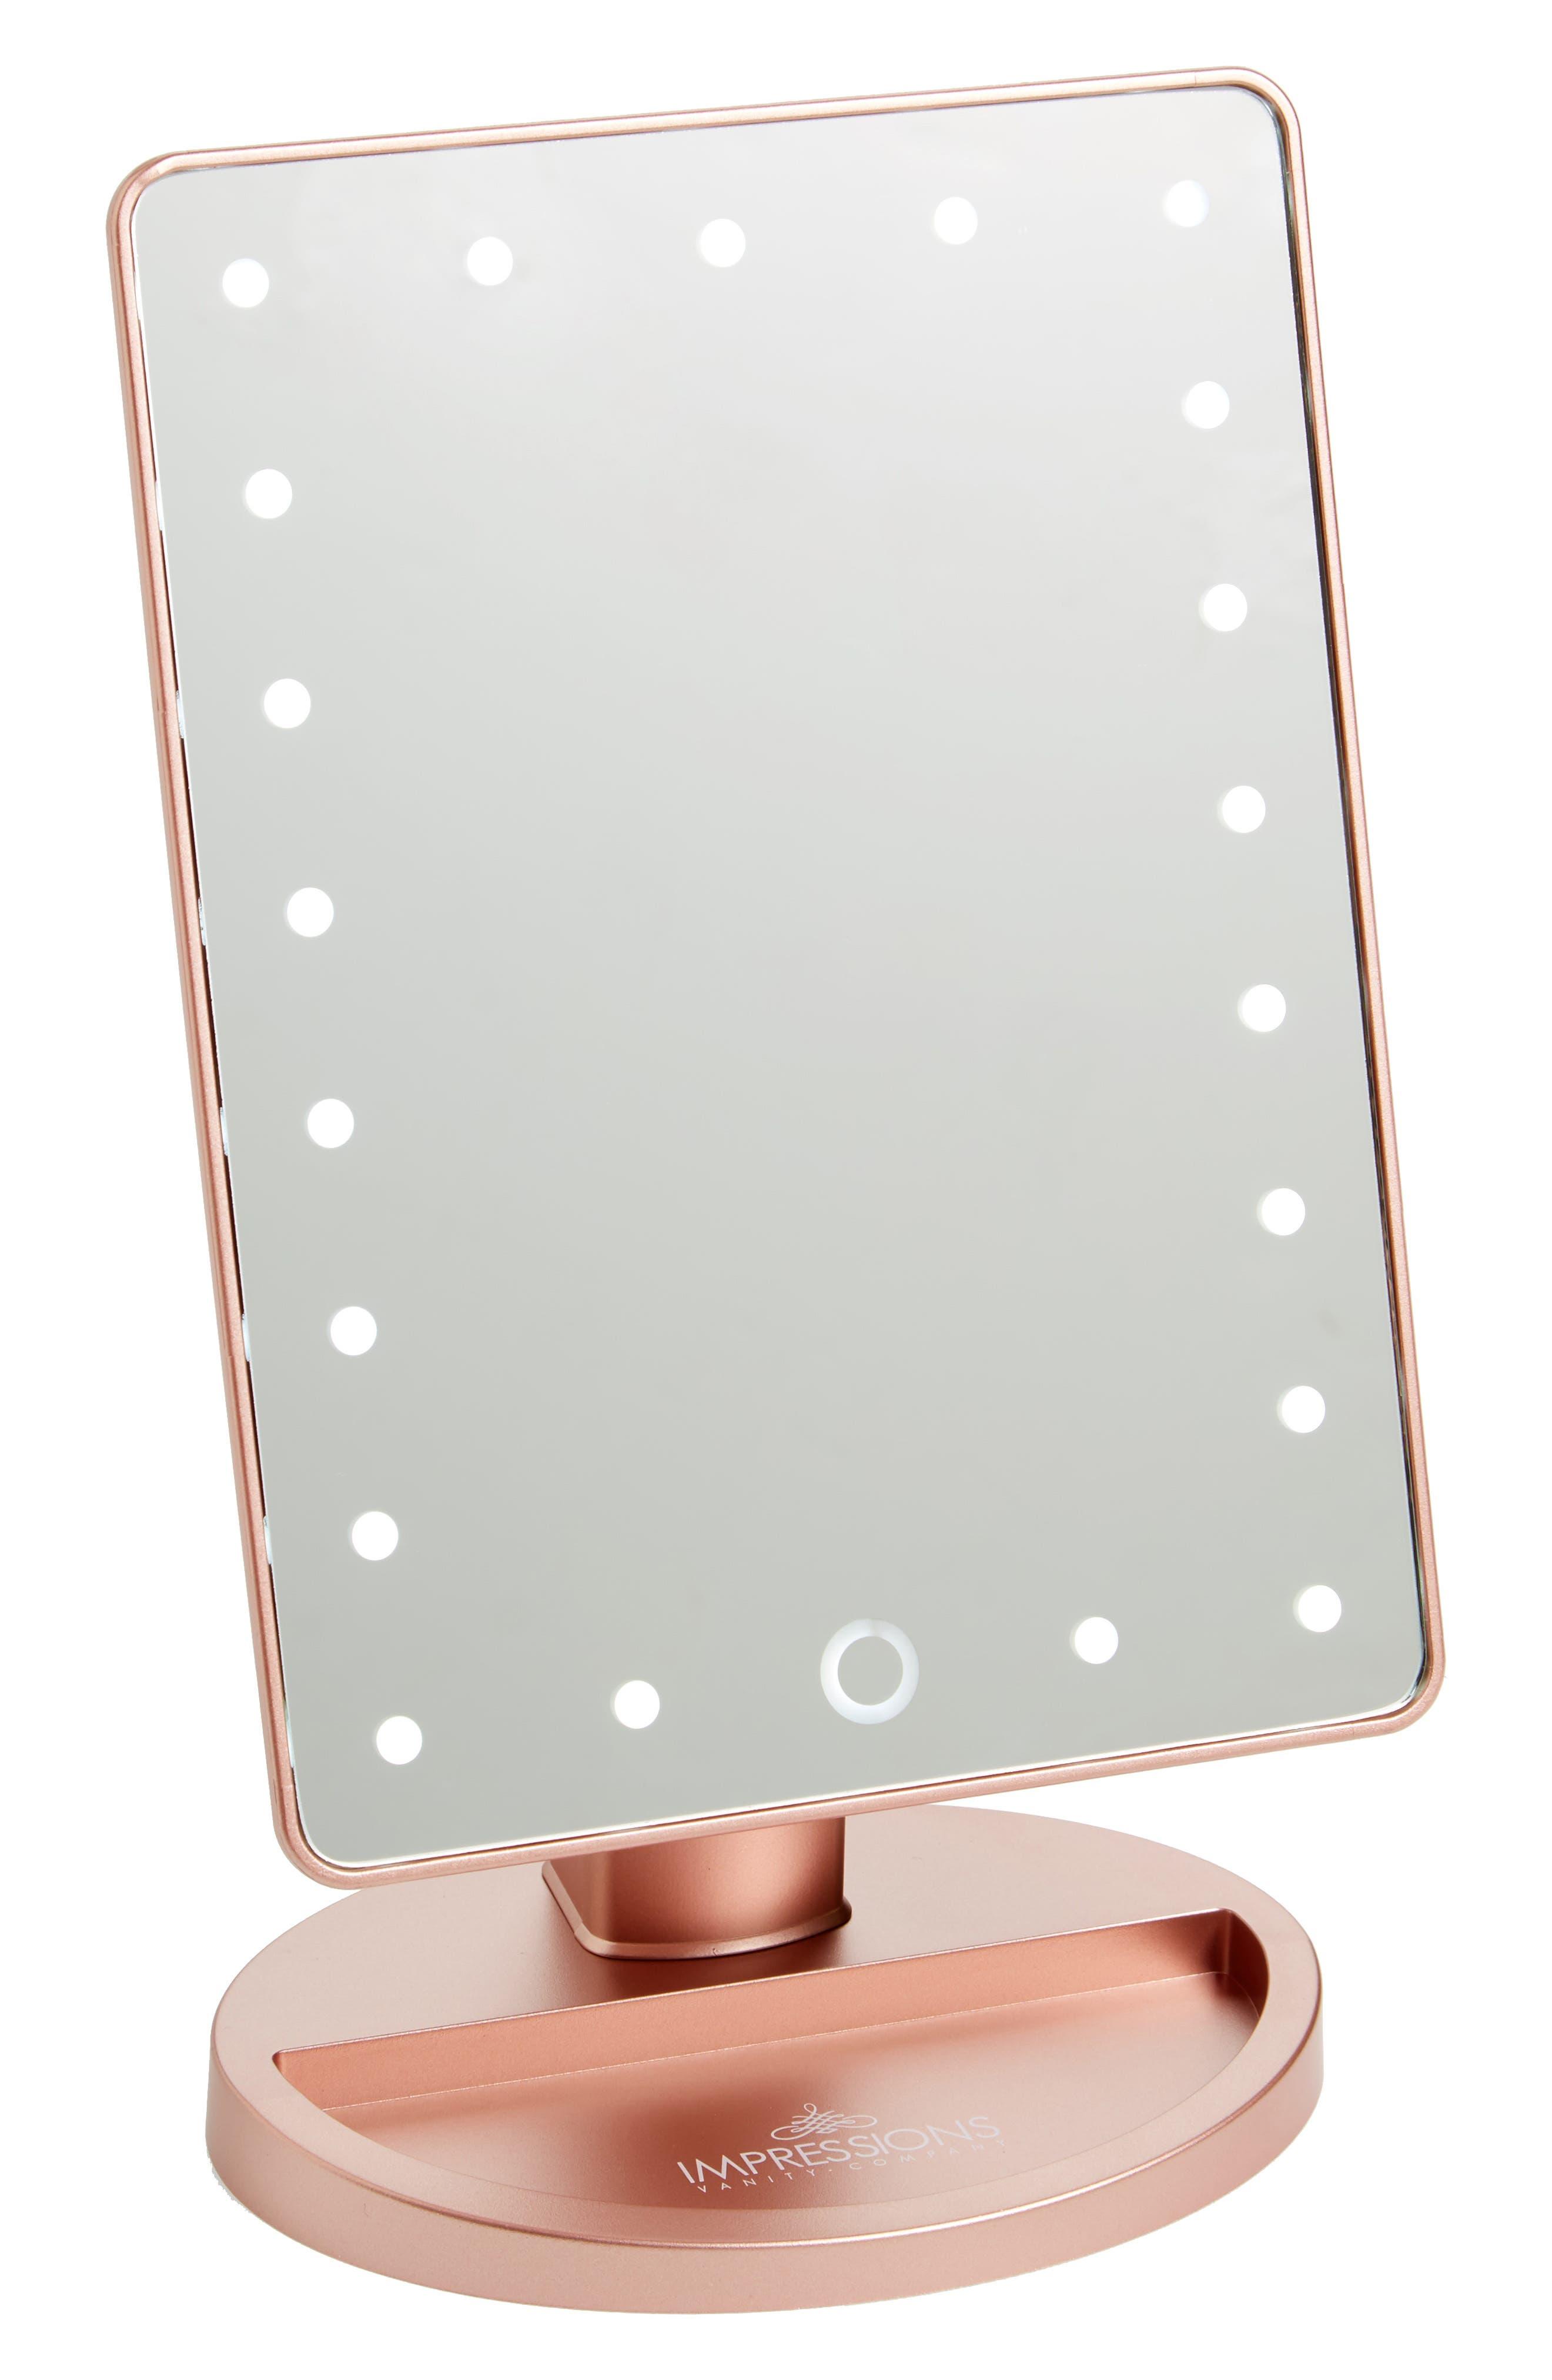 mirror vanity. main image - impressions vanity co. touch 2.0 led mirror i